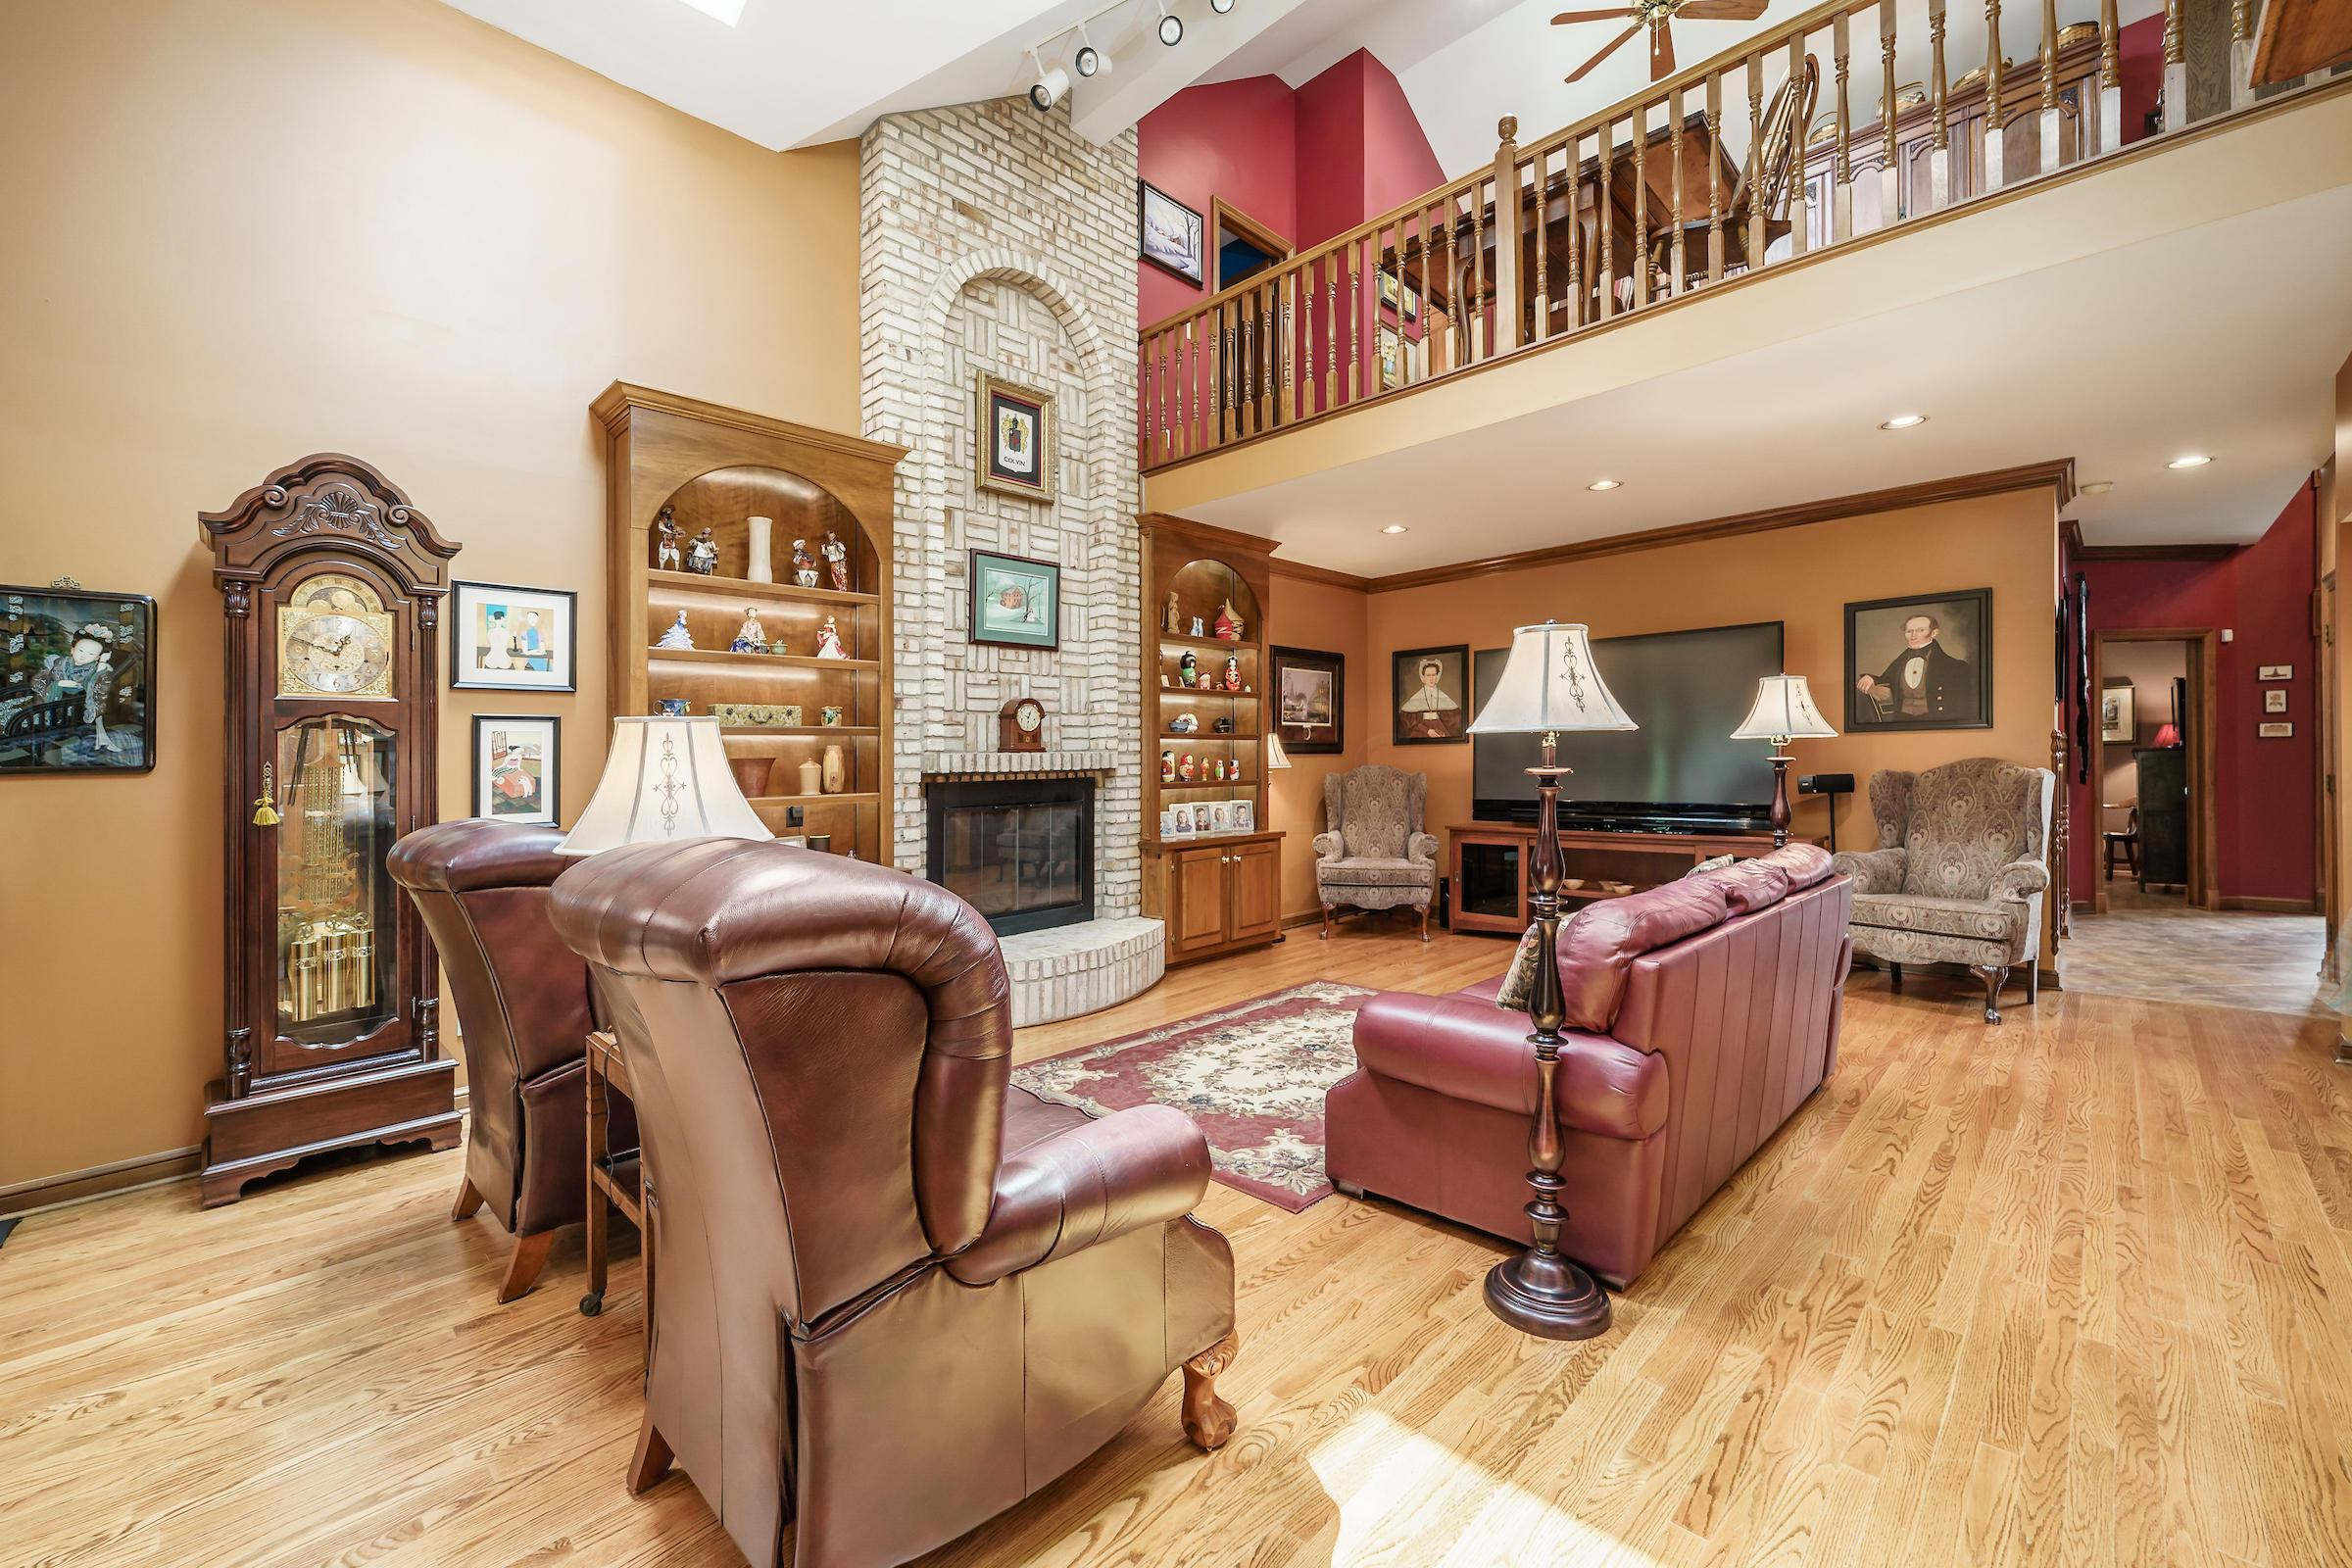 8550 Stonechat Loop, Dublin, Ohio 43017, 4 Bedrooms Bedrooms, ,4 BathroomsBathrooms,Residential,For Sale,Stonechat,220030712